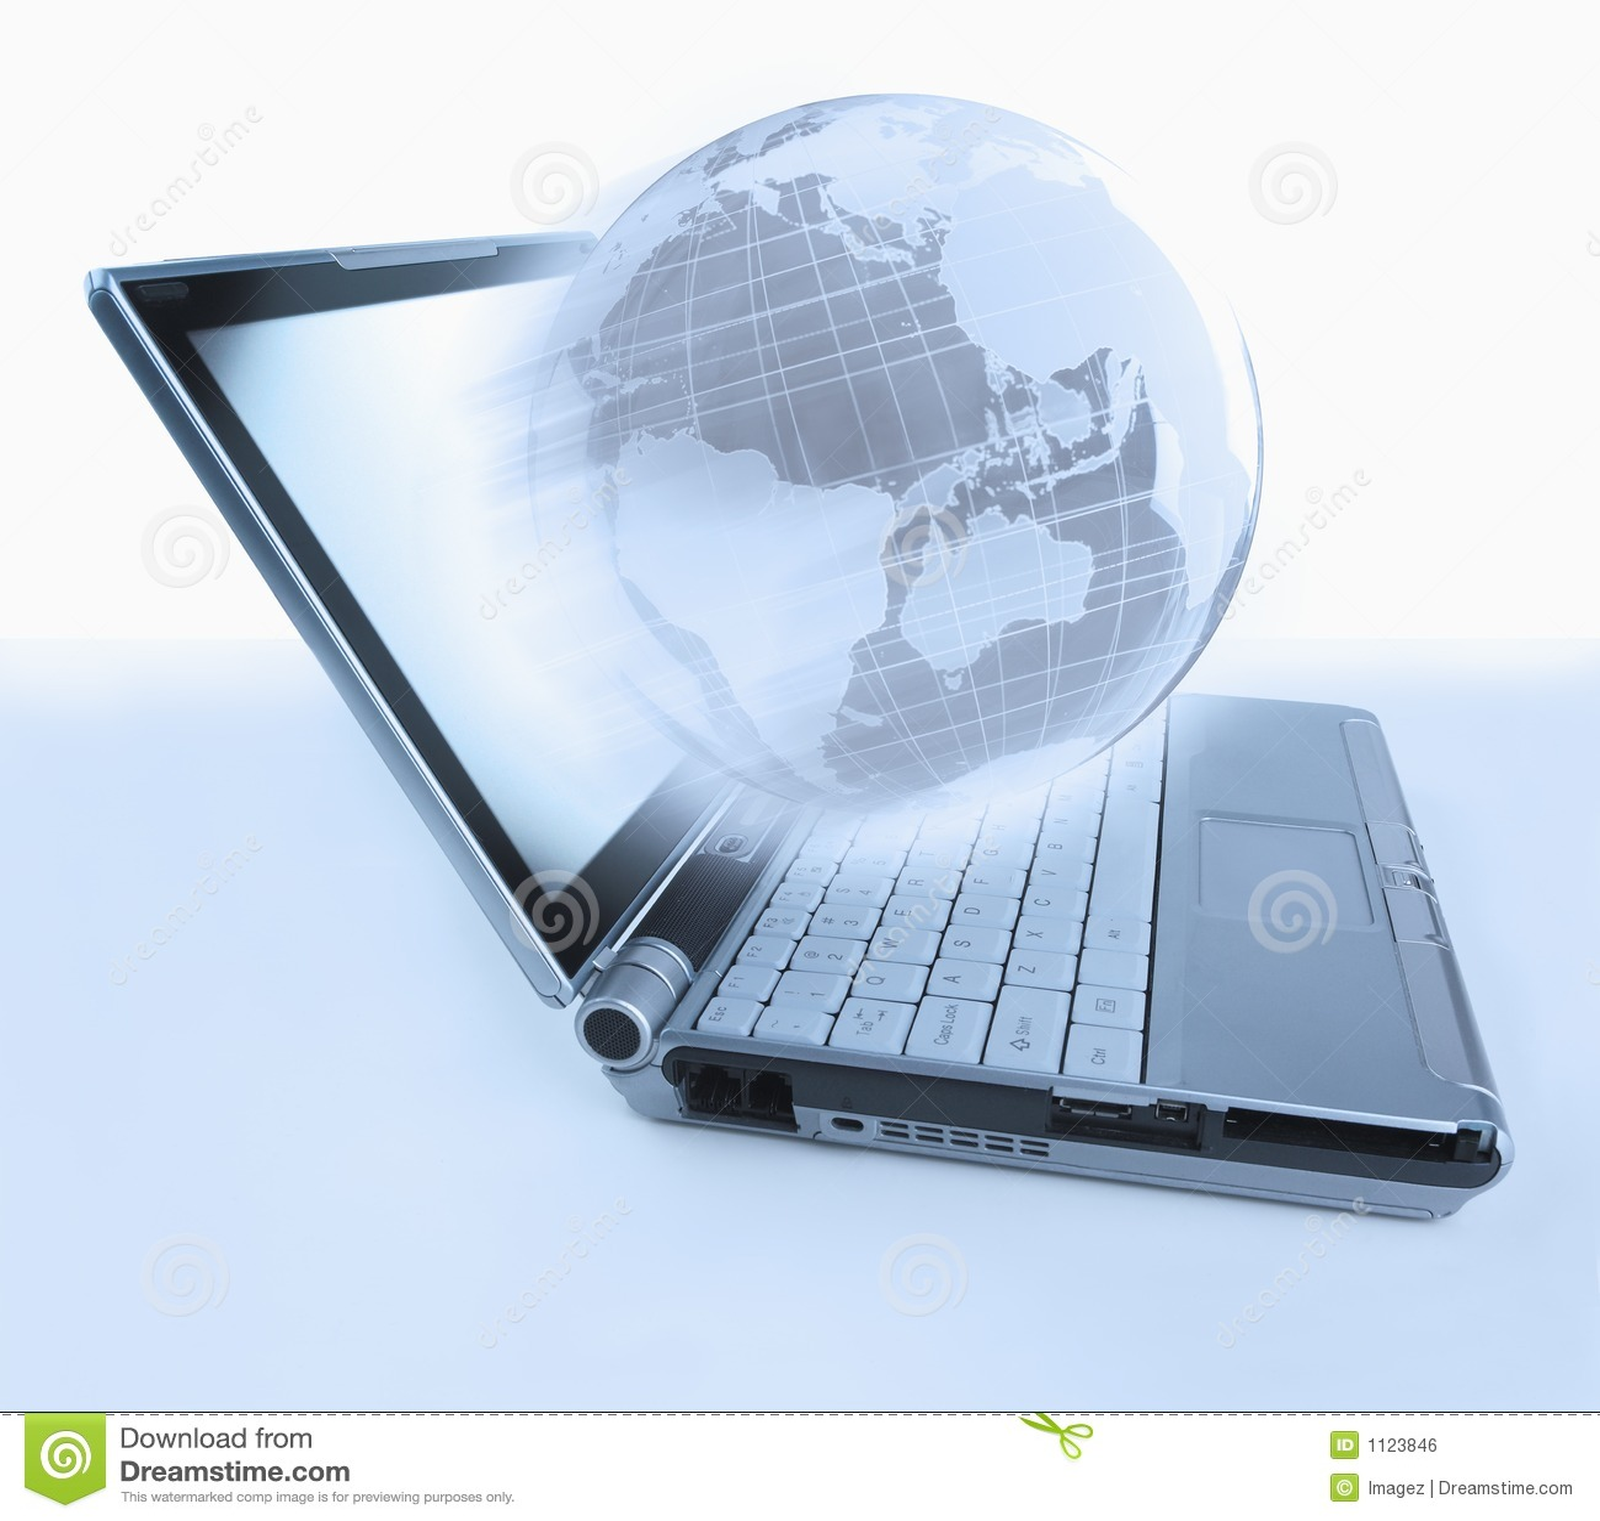 - globus laptop